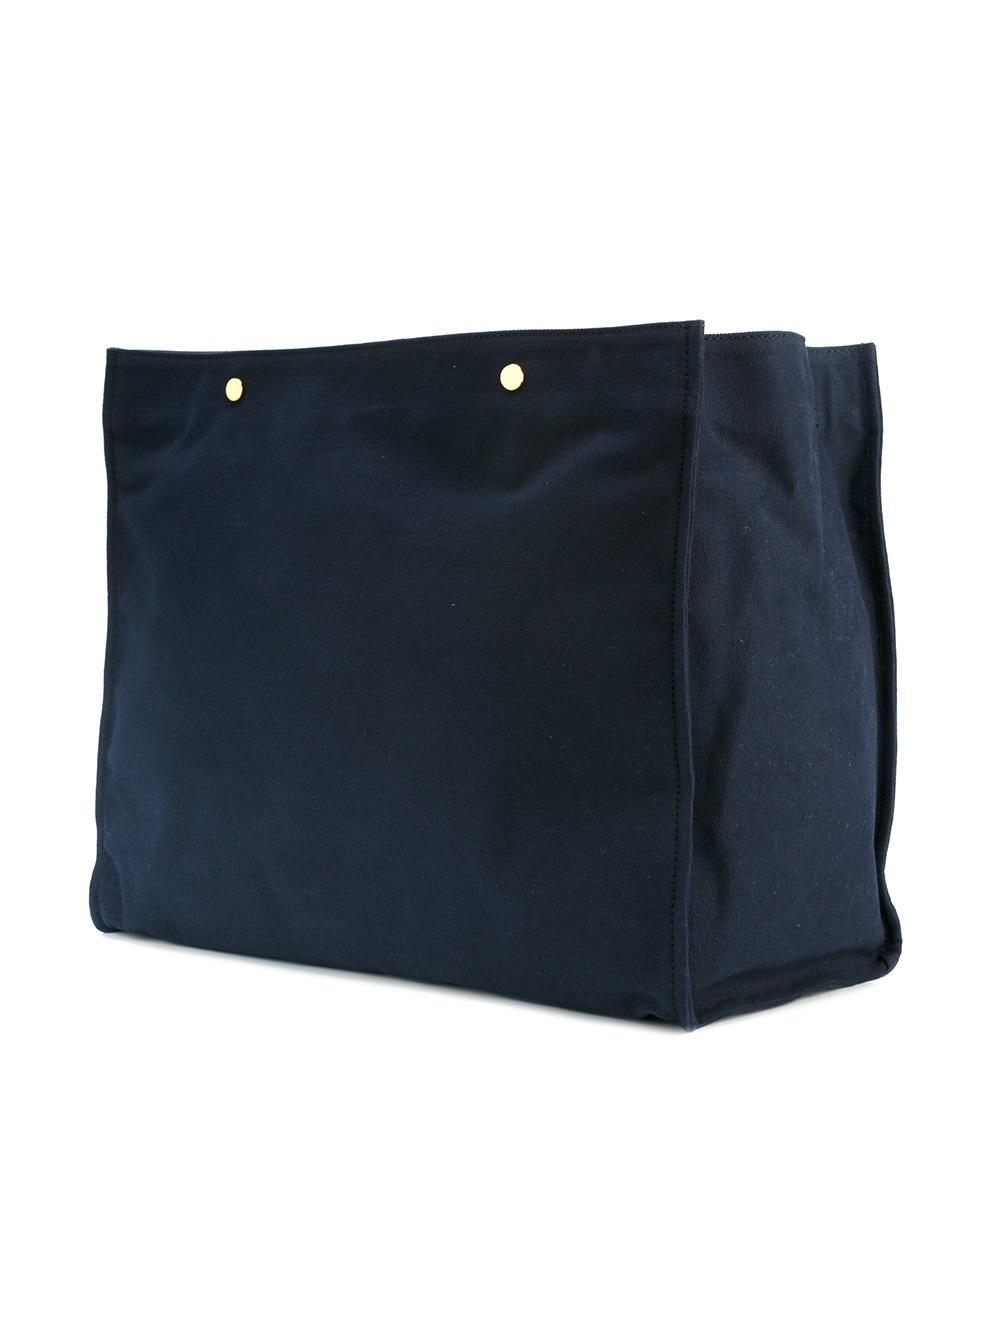 Marni Marni Logo Patch Shoulder Bag